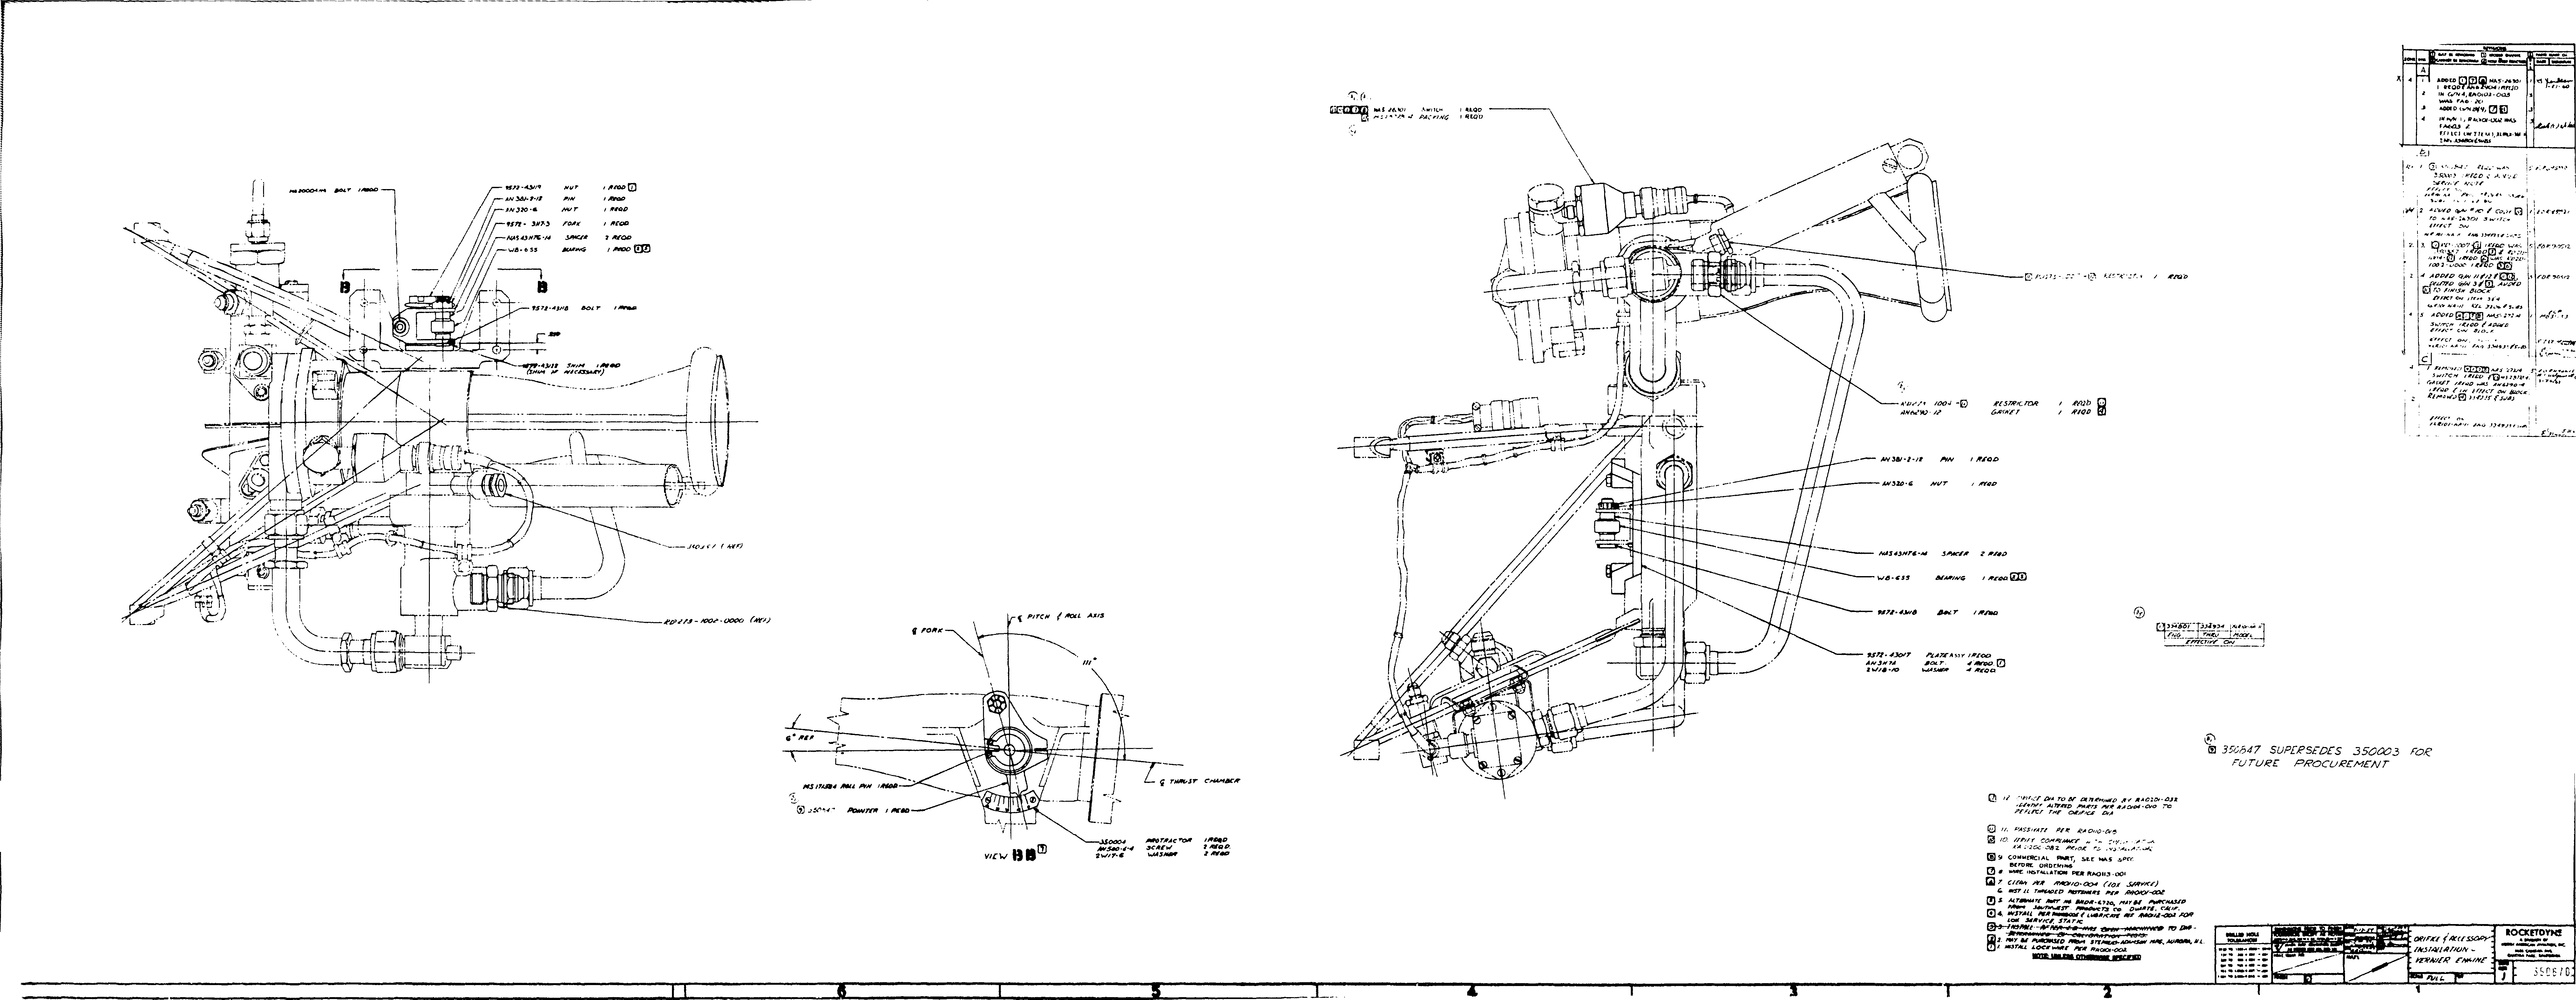 LR-101 Vernier Engine